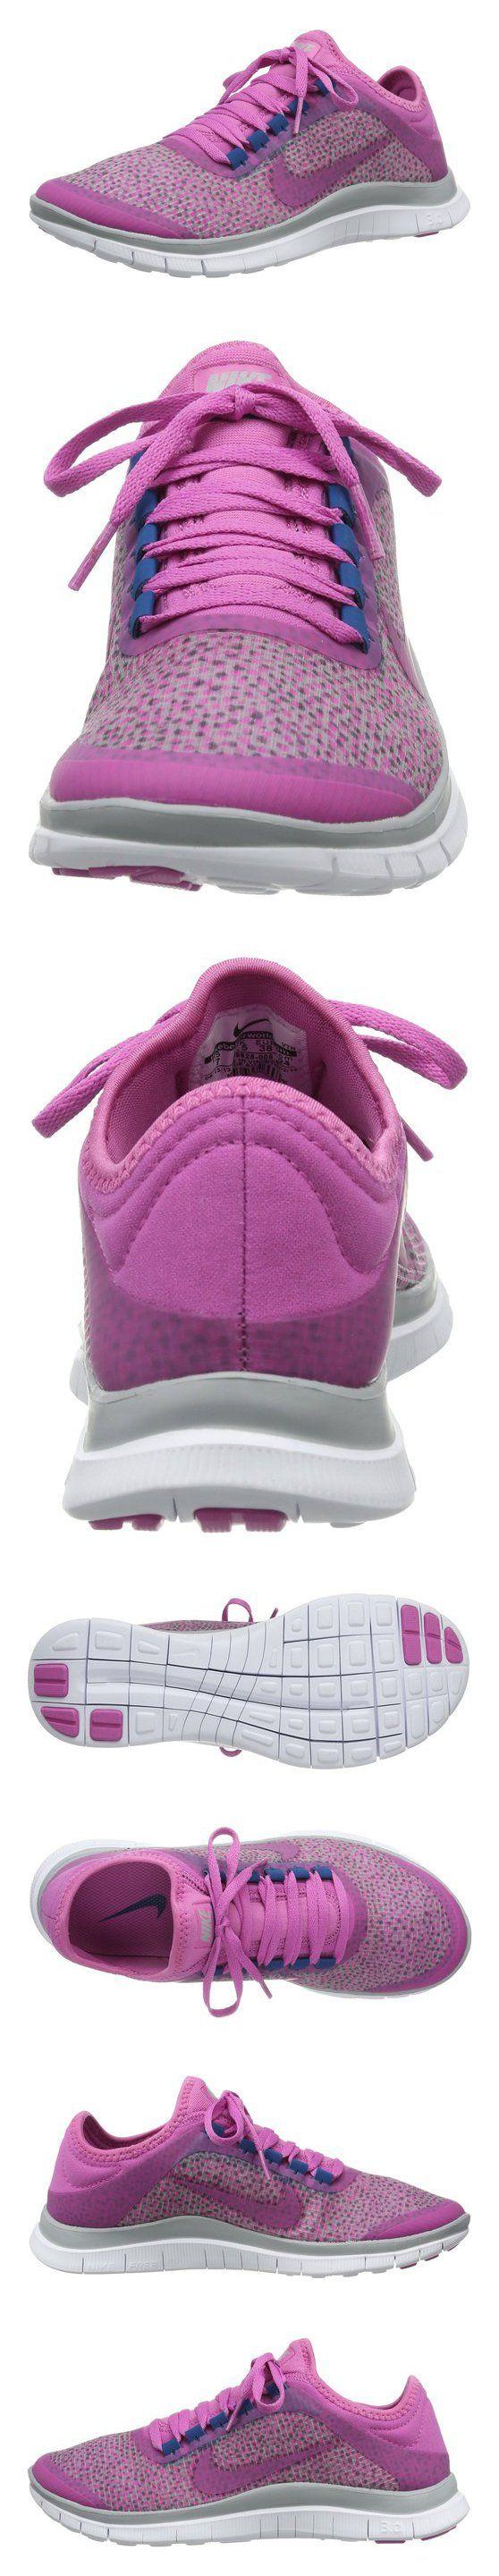 $110 - Nike Women's Free 3.0 V5 EXT Running Sneaker #shoes #nike #2014